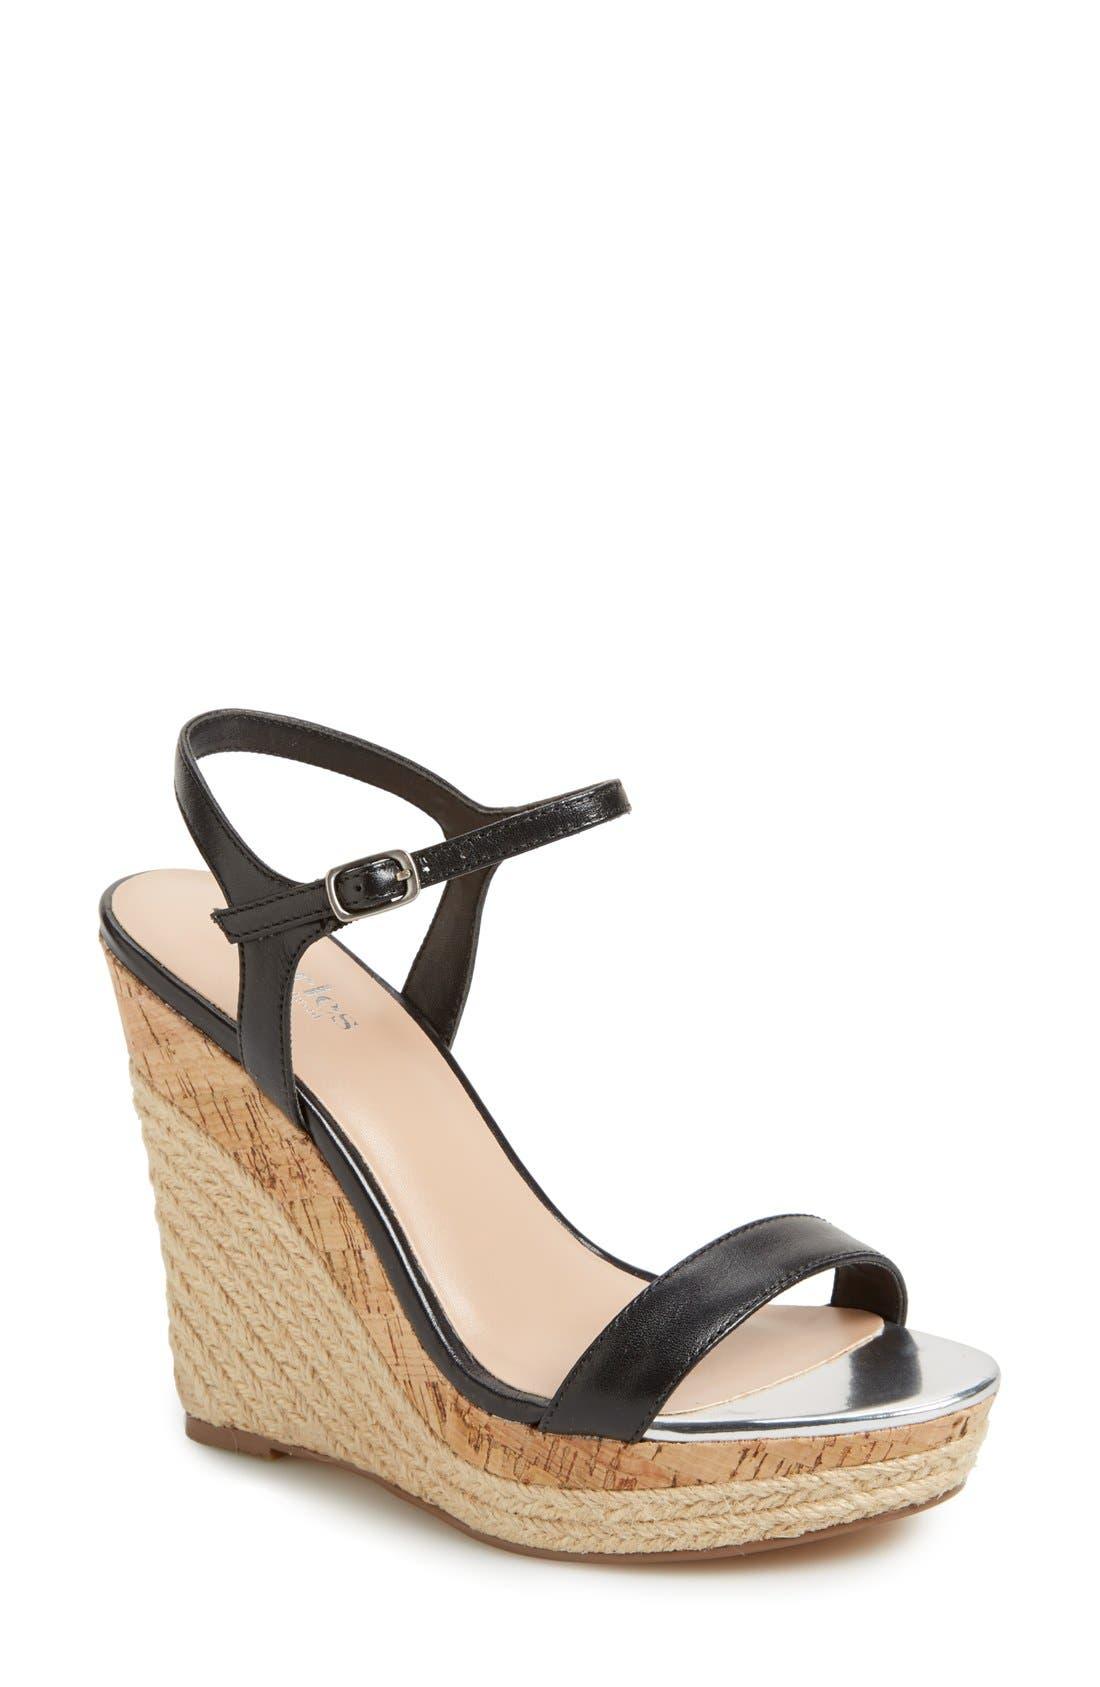 'Alabama' Espadrille Wedge Sandal, Main, color, 001